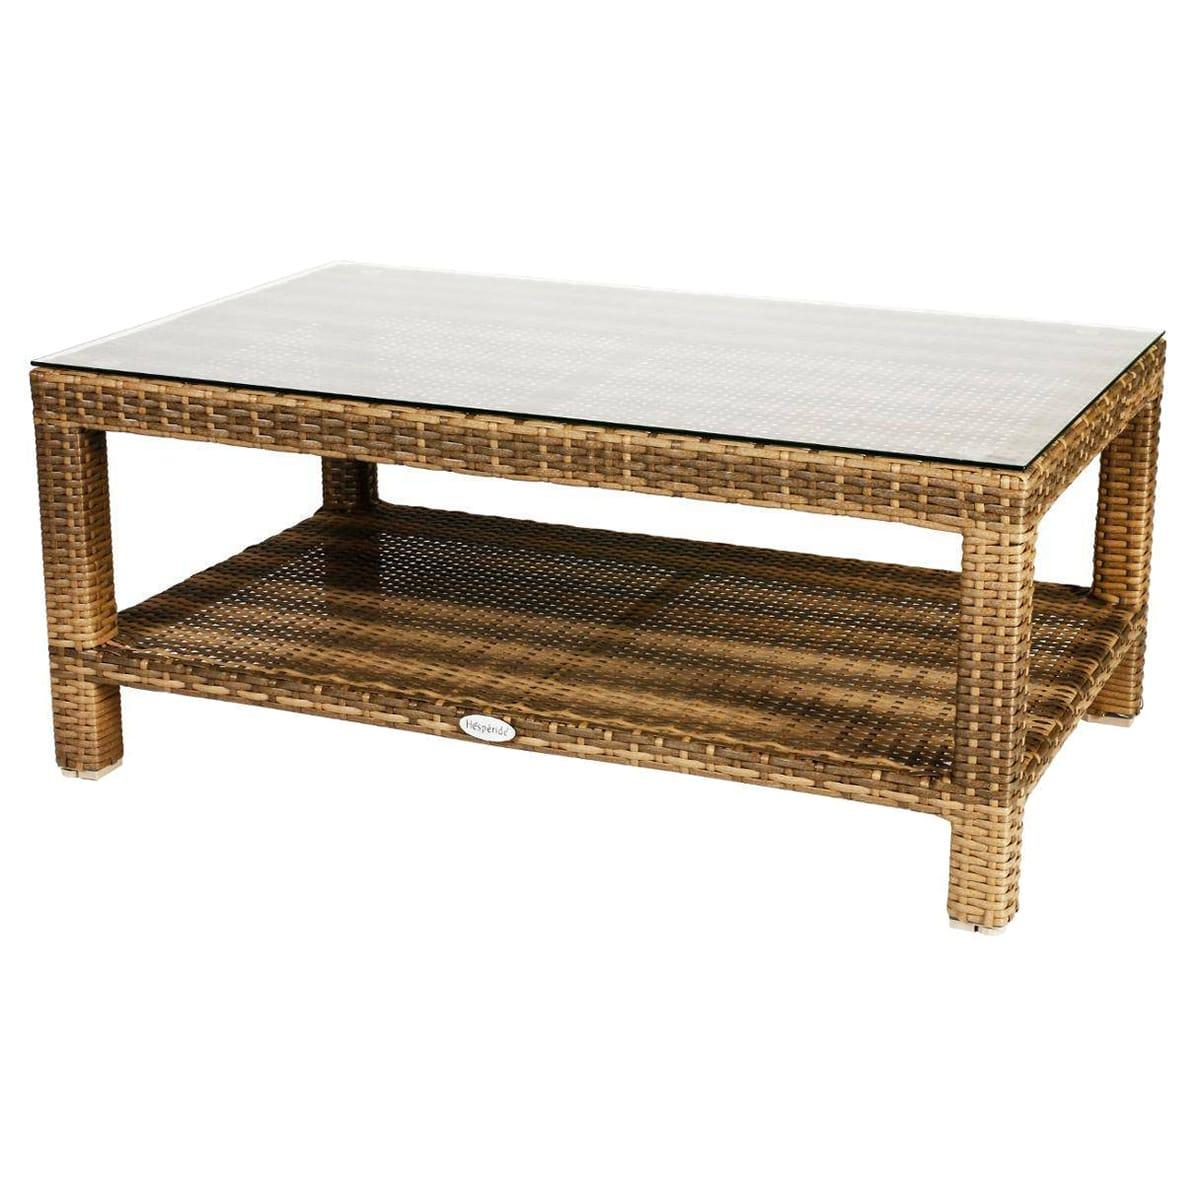 Table basse de jardin rectangulaire Cuba Naturae - 102x65x44 cm - Hespéride